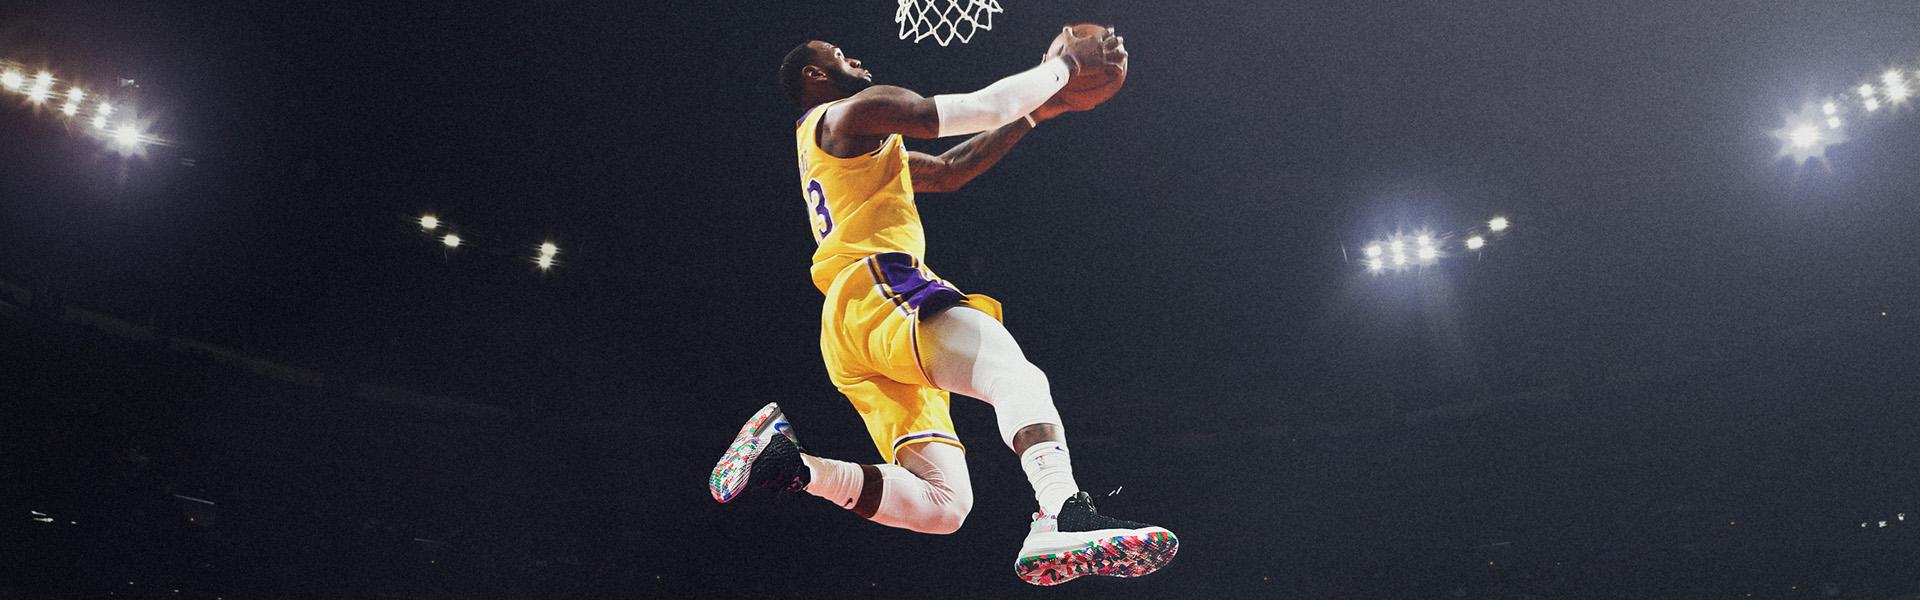 Nike Lebron 18 banner 1